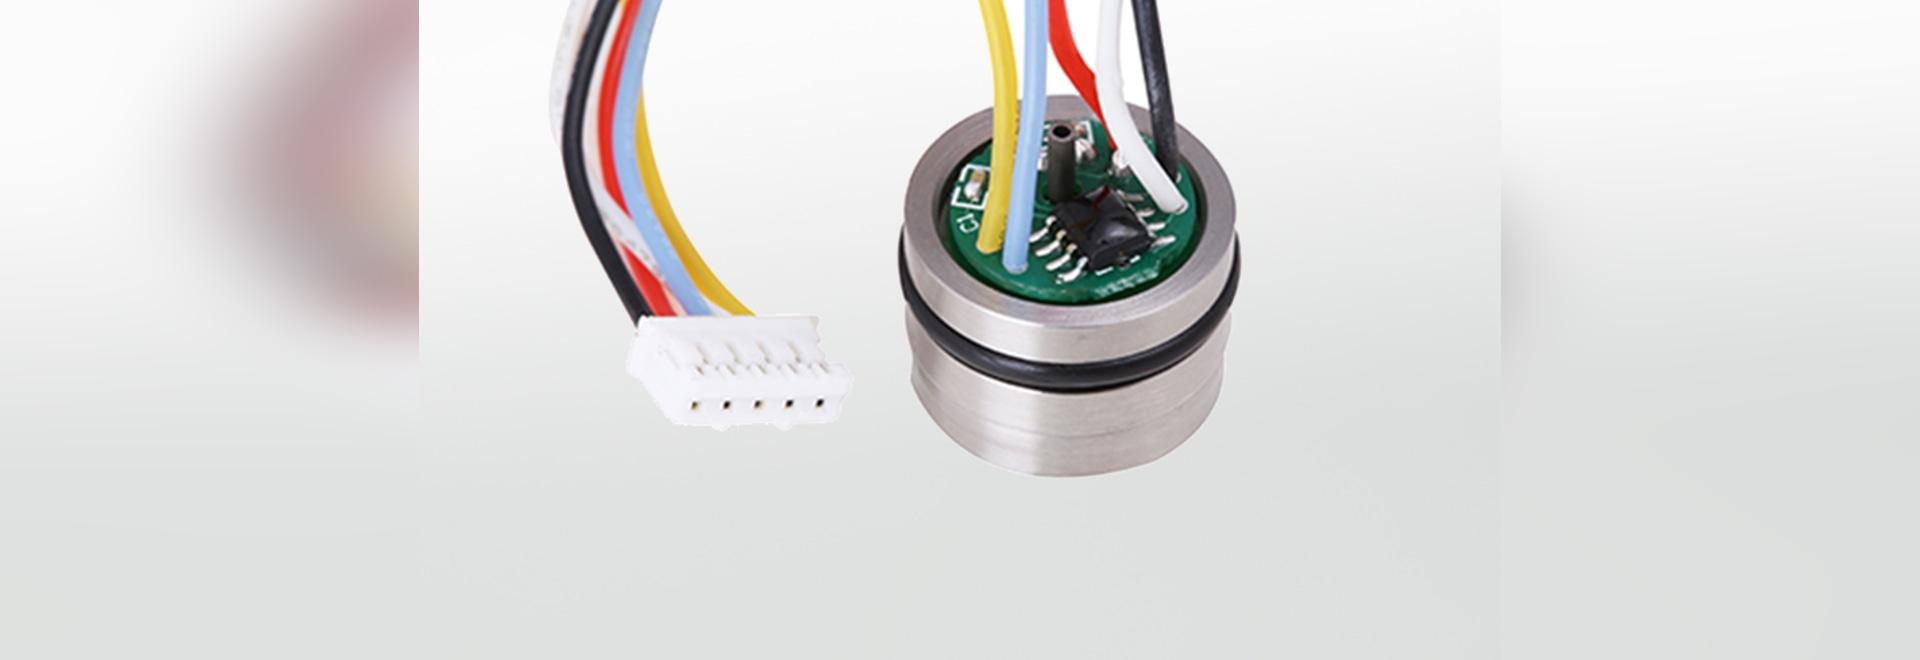 MPM3808 I2C Digital Output Pressure Transducer